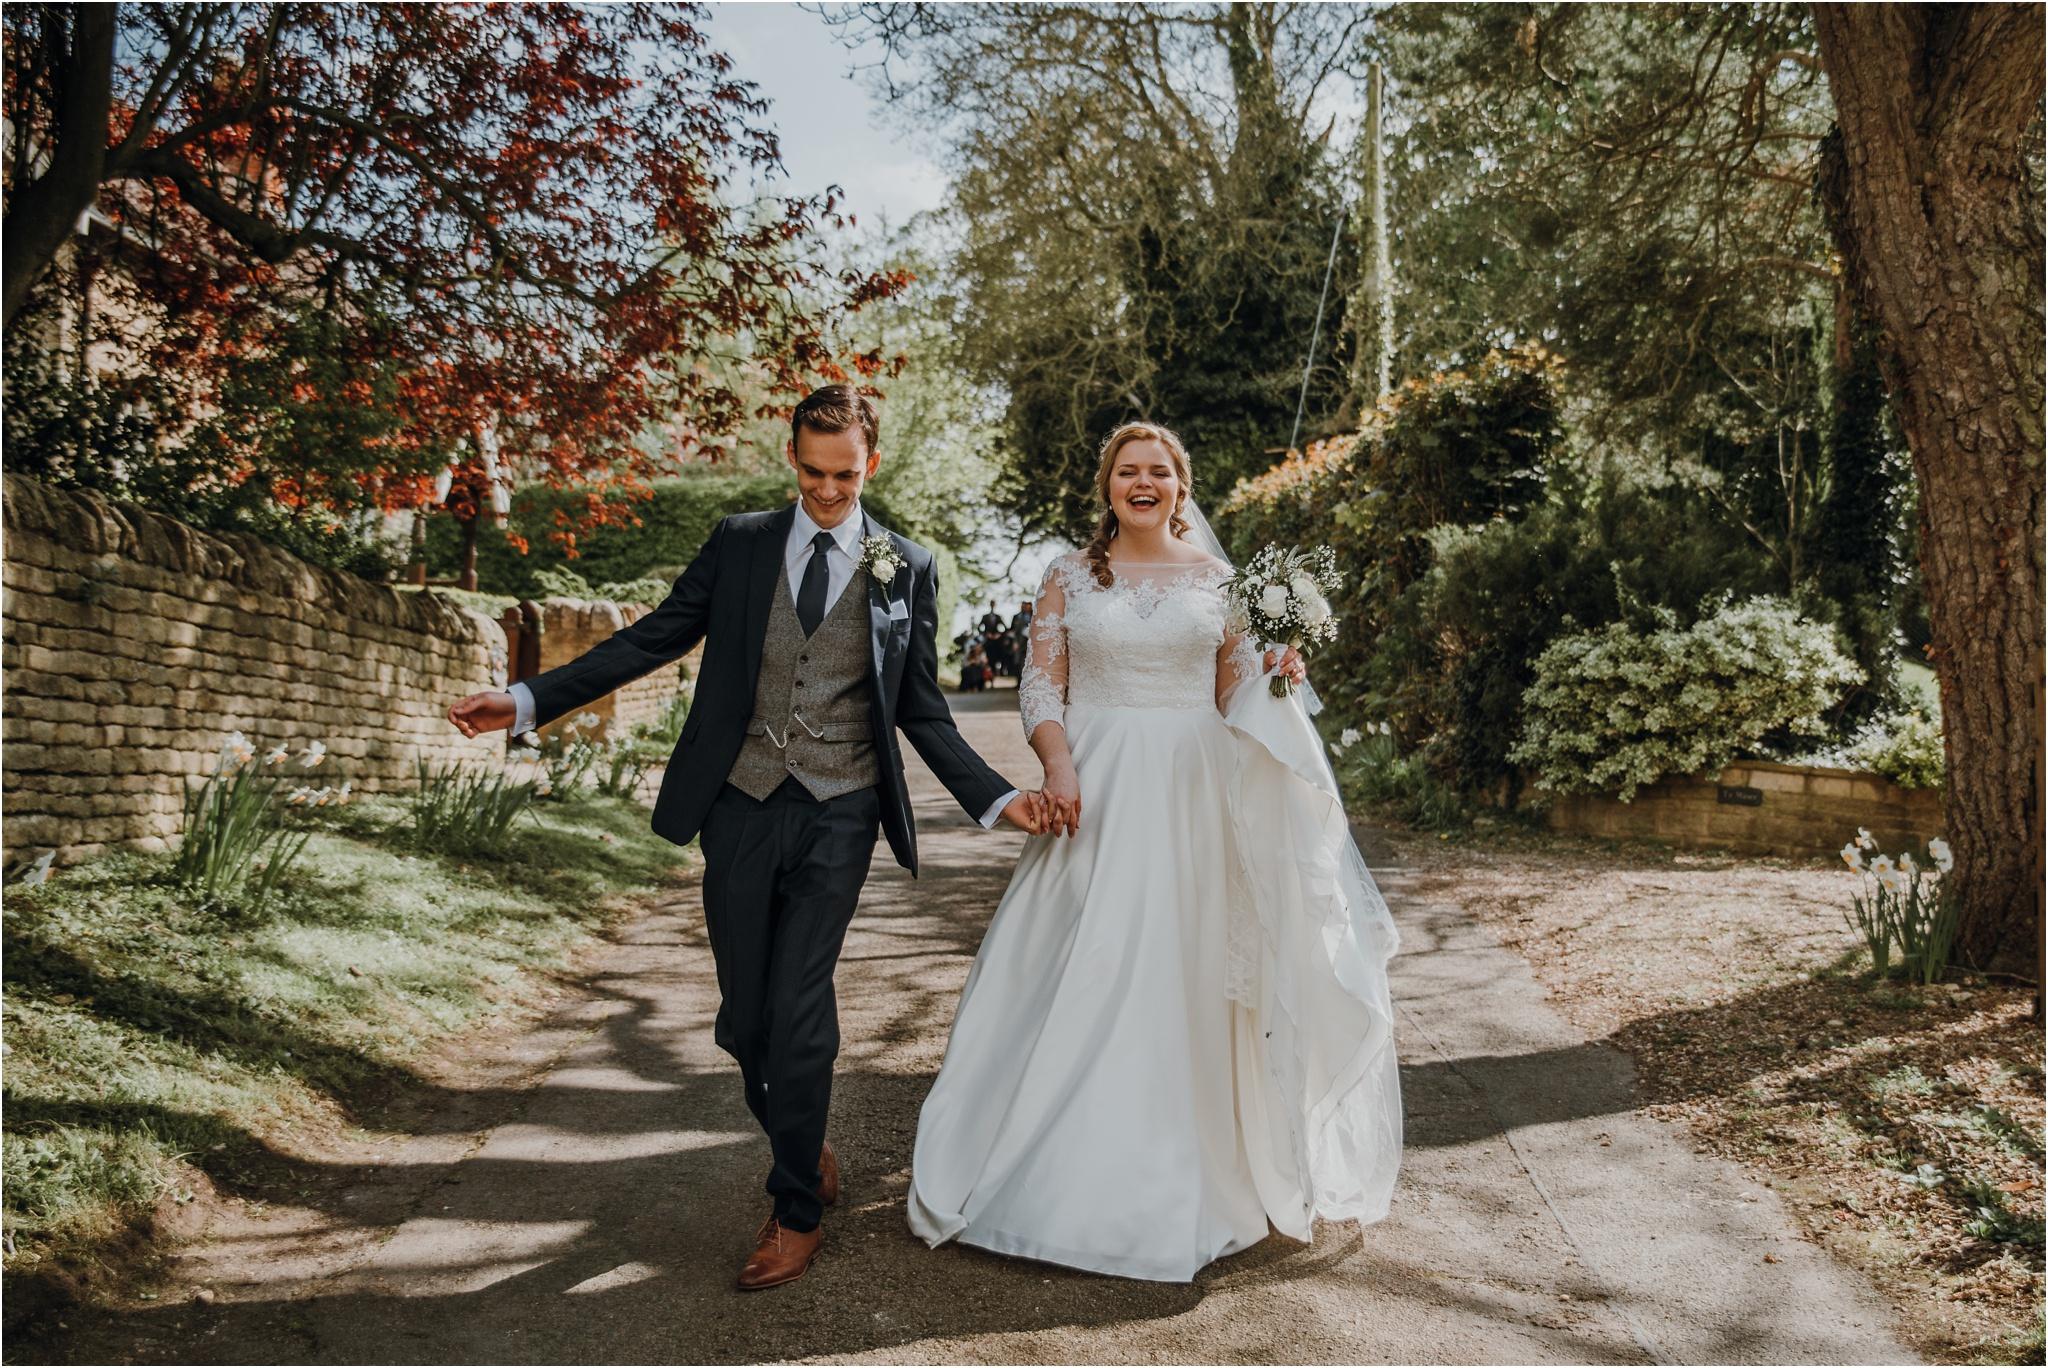 Outdoor-country-wedding-Edinburgh-photographer__0079.jpg